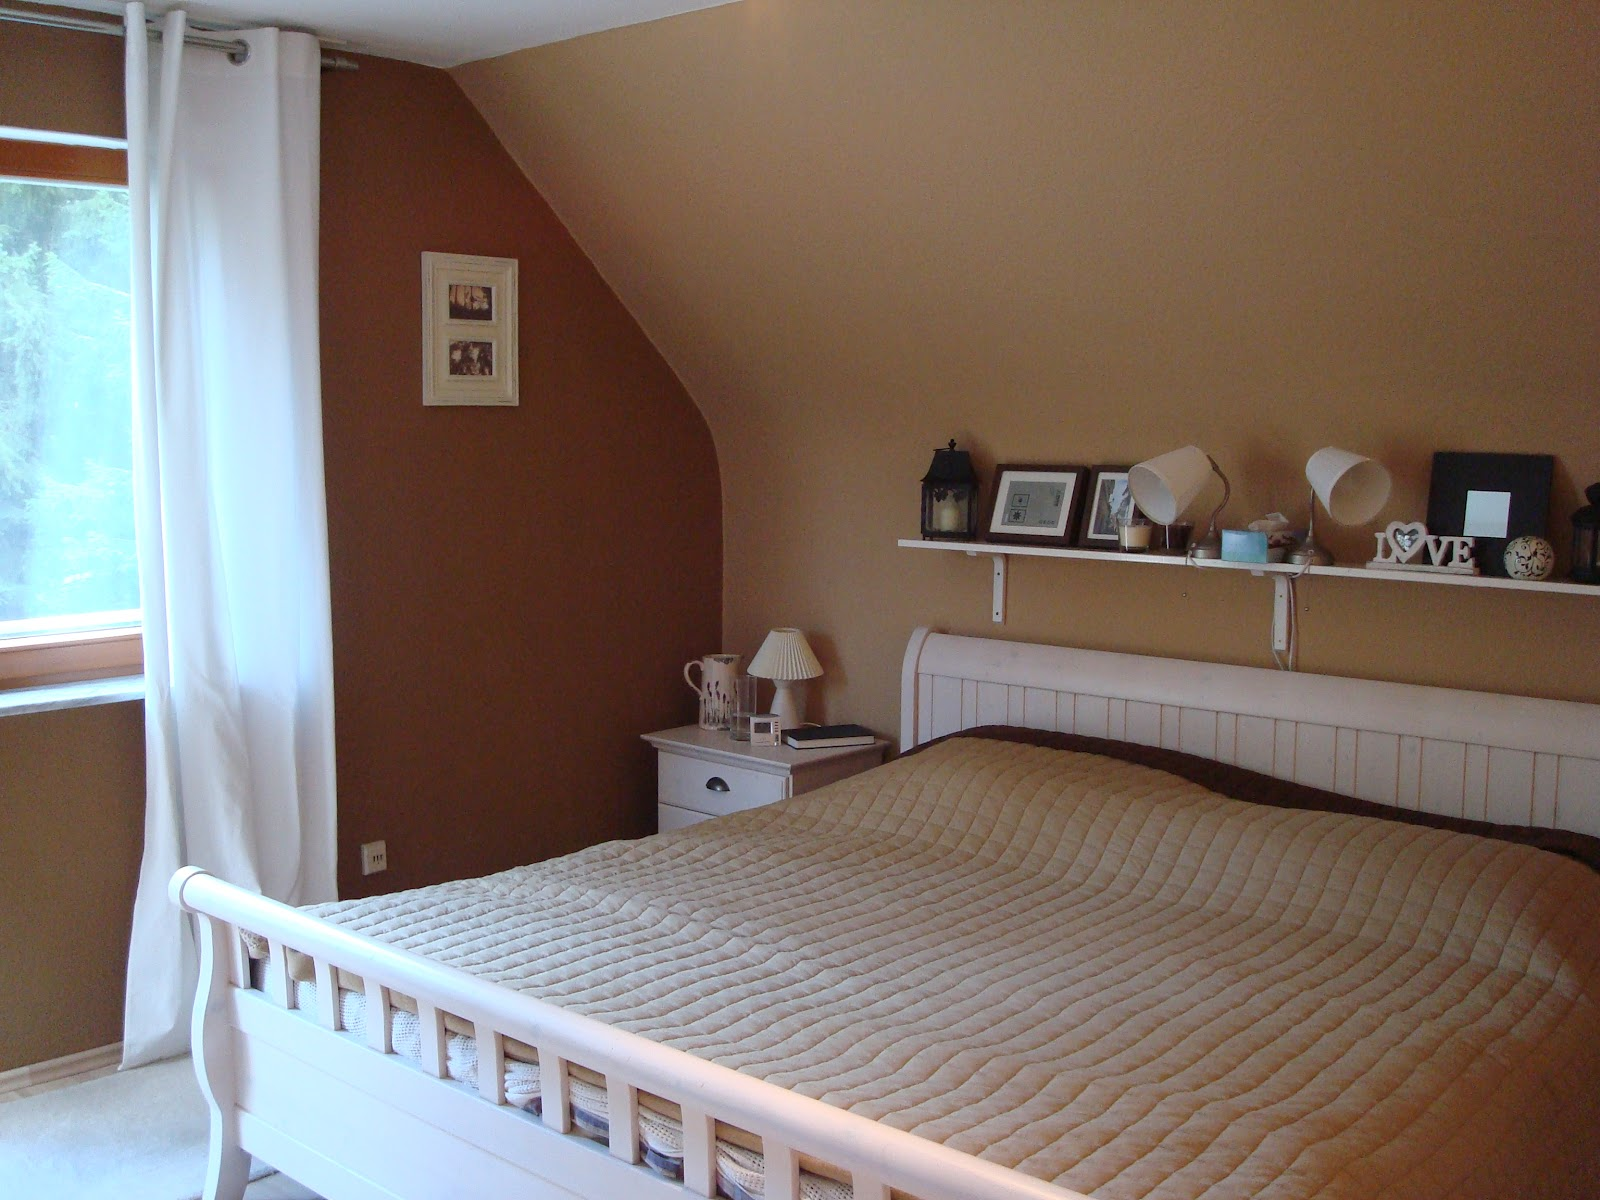 scrap 39 39 this 39 39 mein neues schlafzimmer. Black Bedroom Furniture Sets. Home Design Ideas